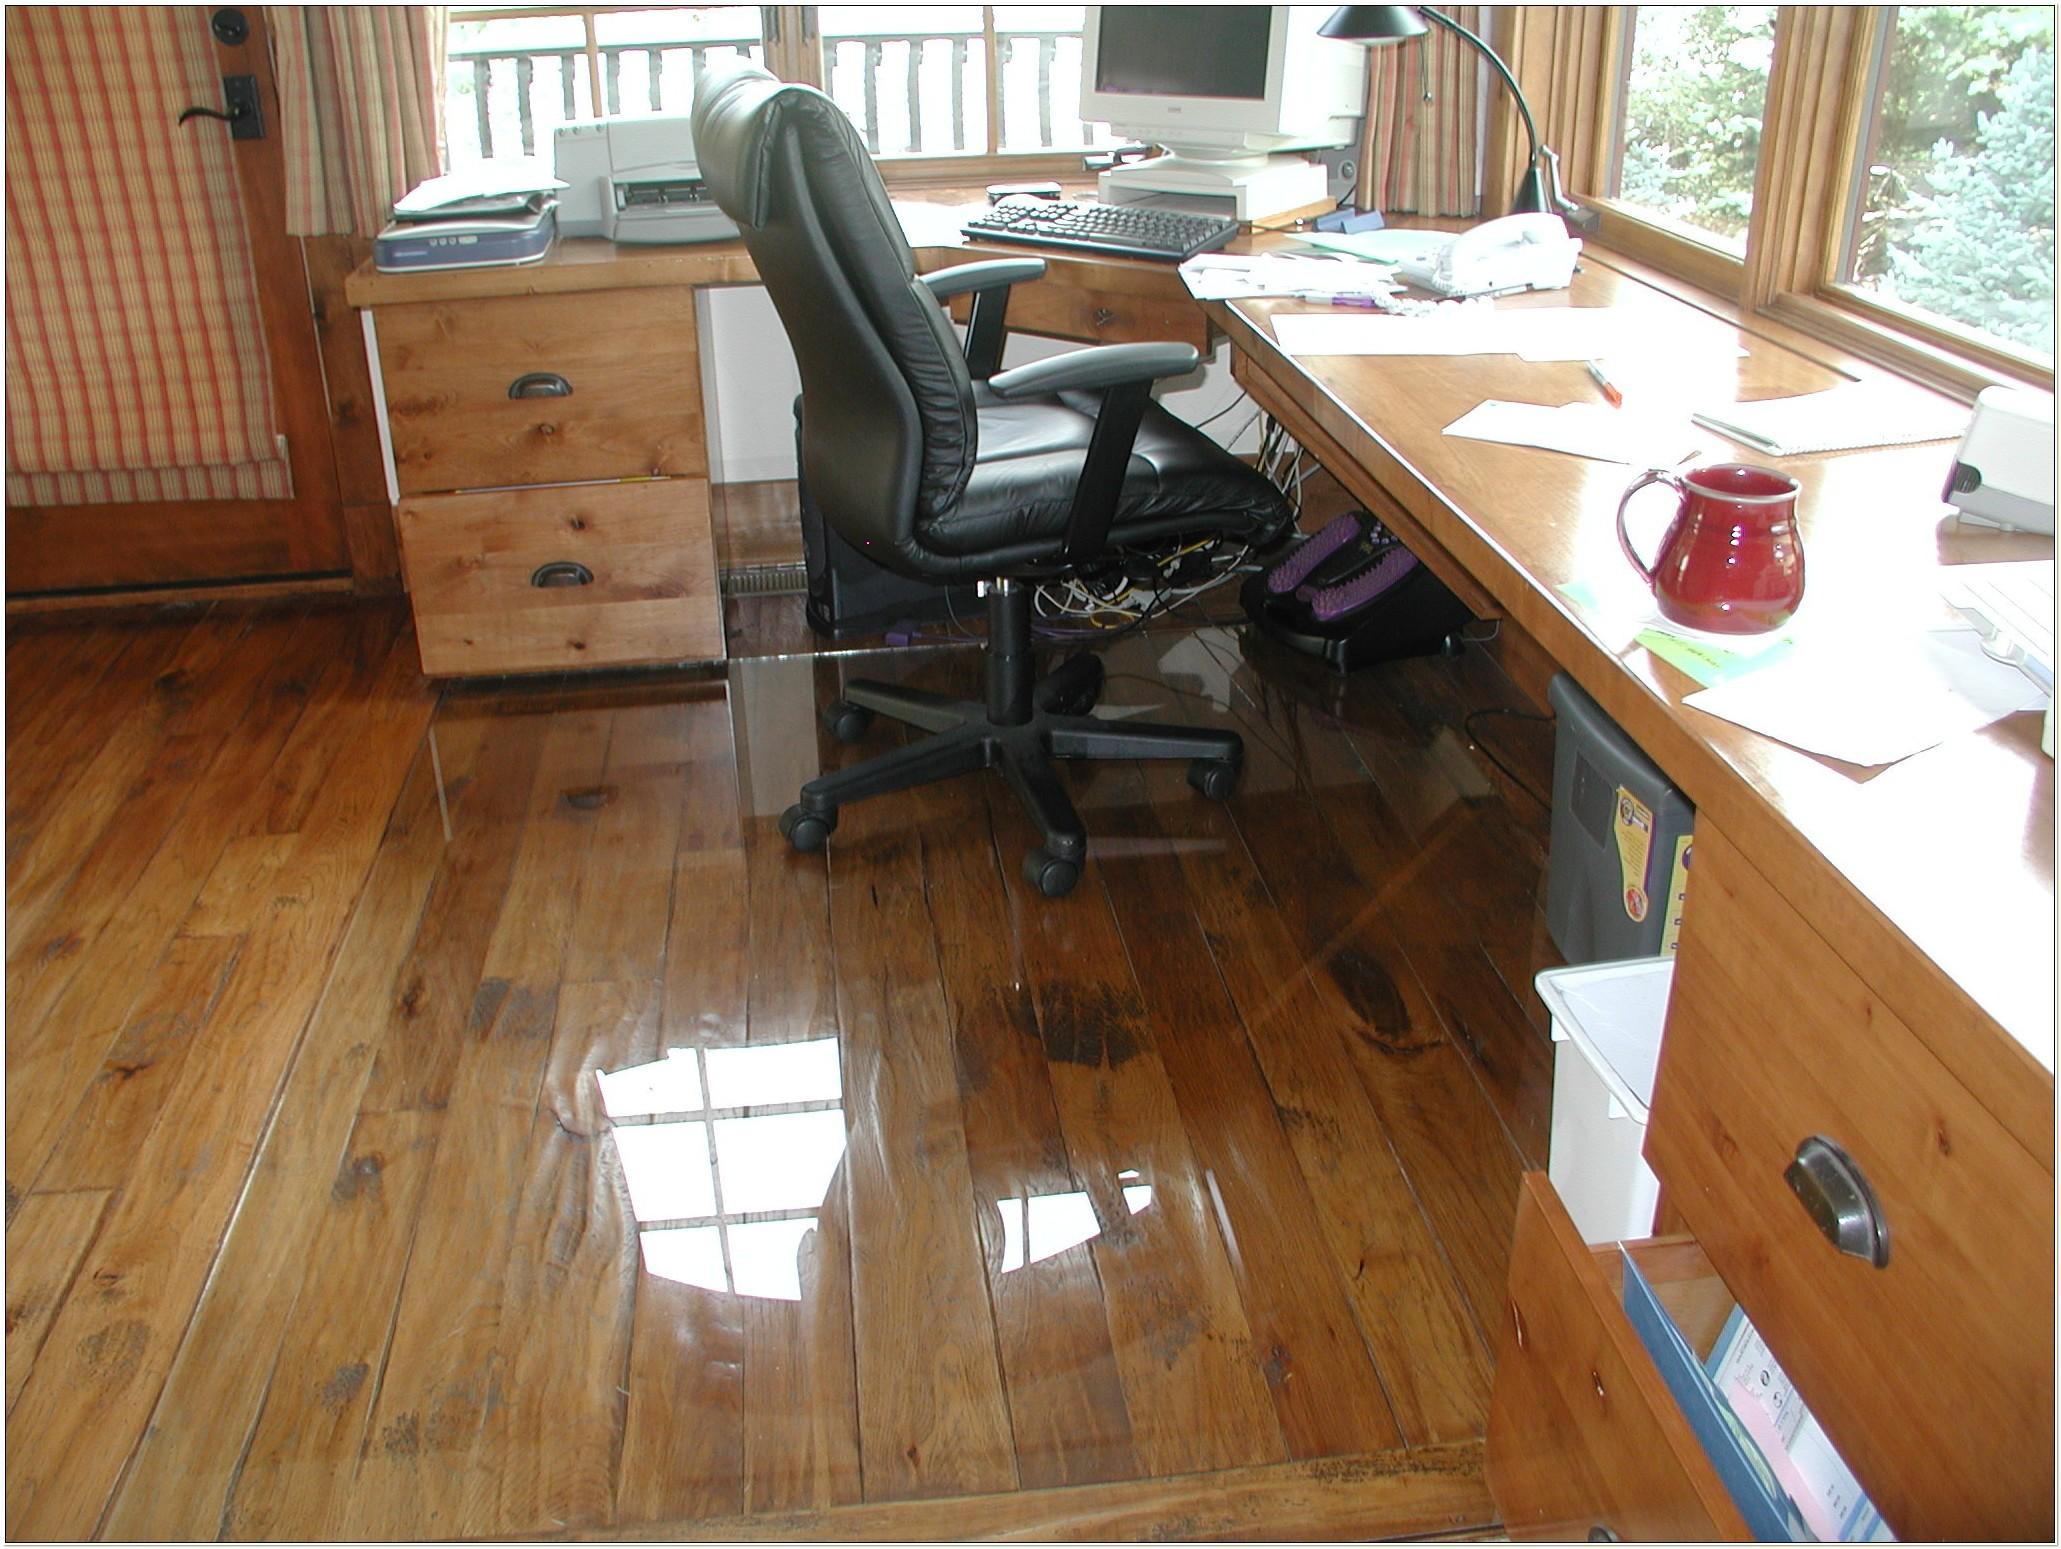 Best Computer Chair Mat For Hardwood Floors